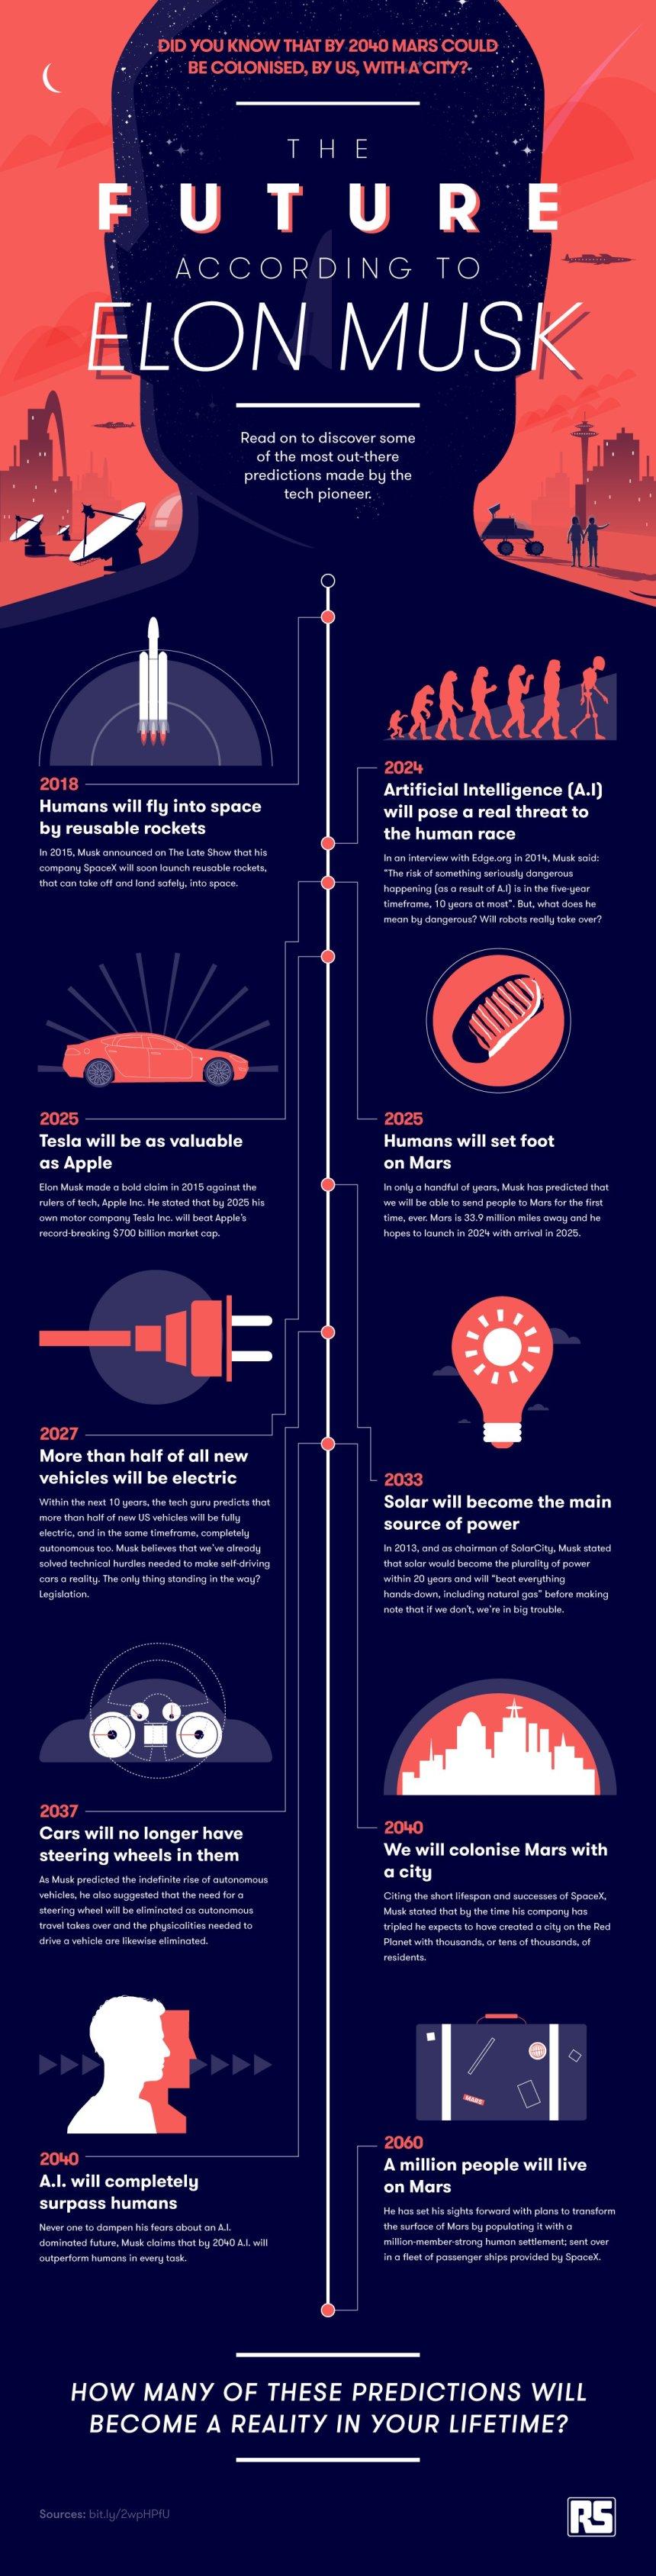 El futuro según Elon Musk